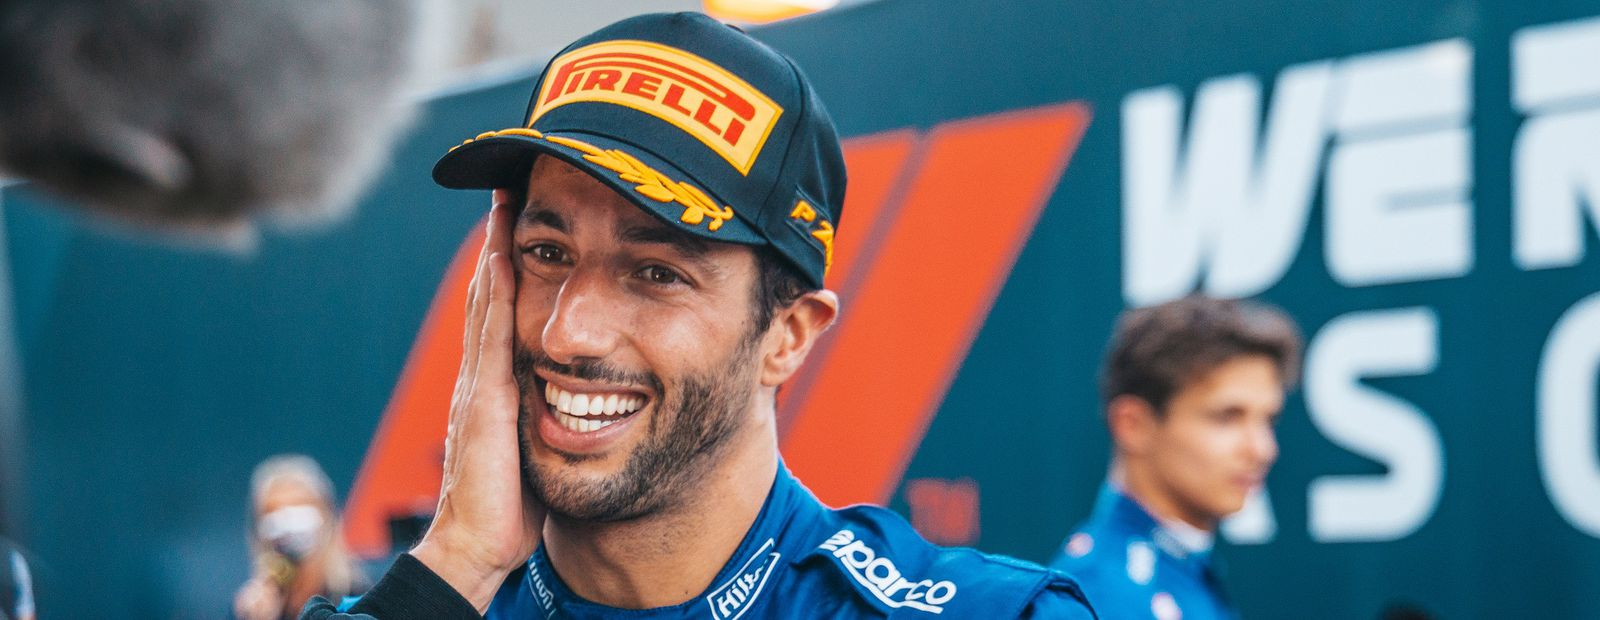 Ricciardo's resurgence